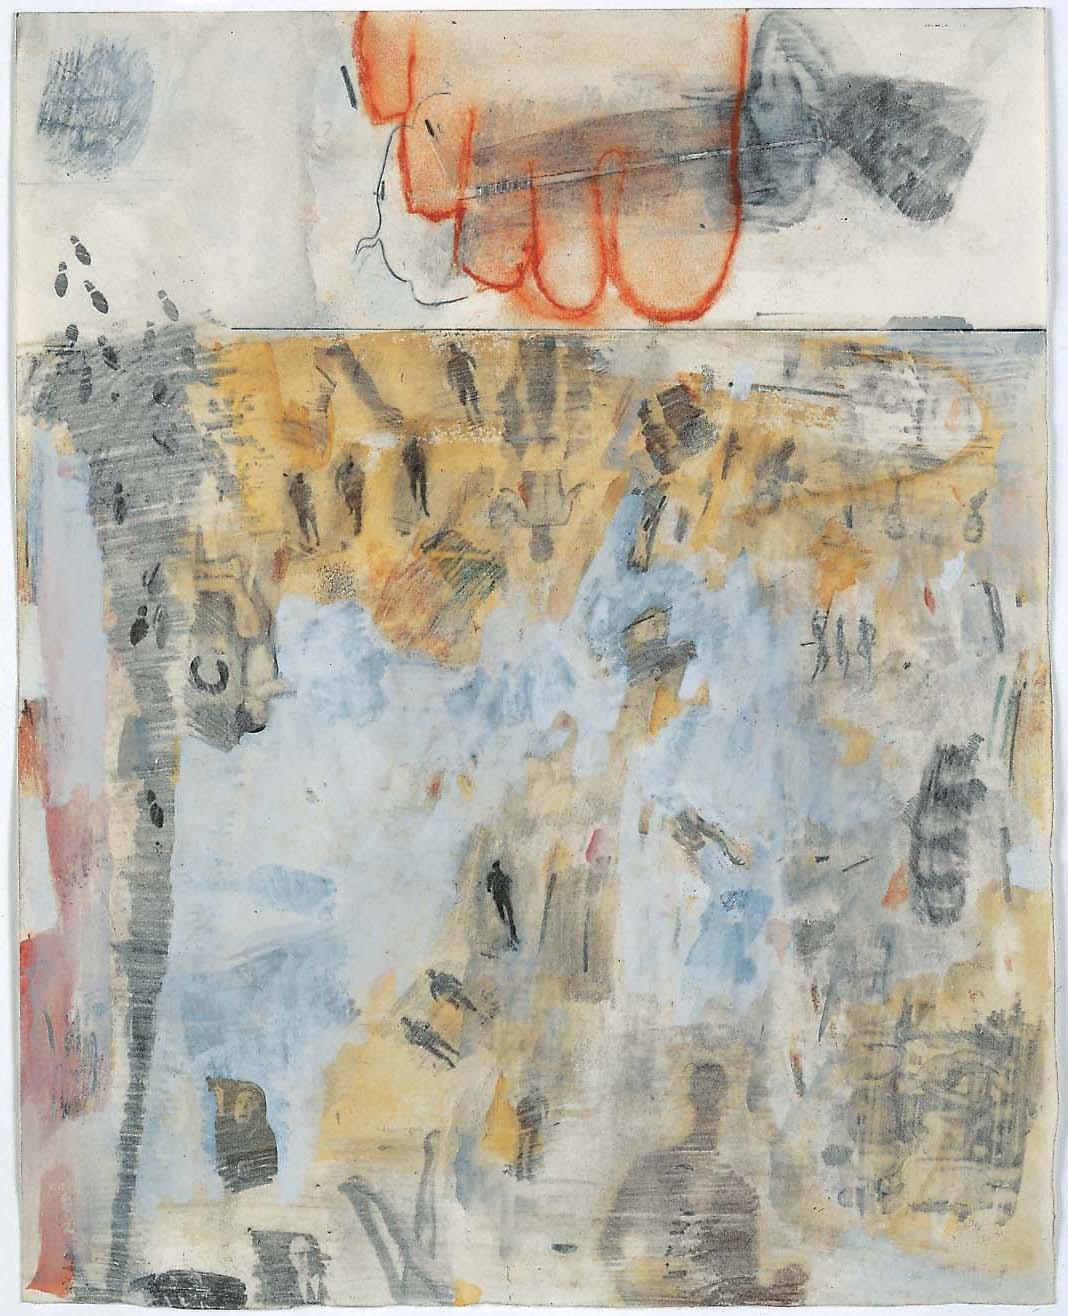 Rauschenberg Canto XIV Dante transfer drawings